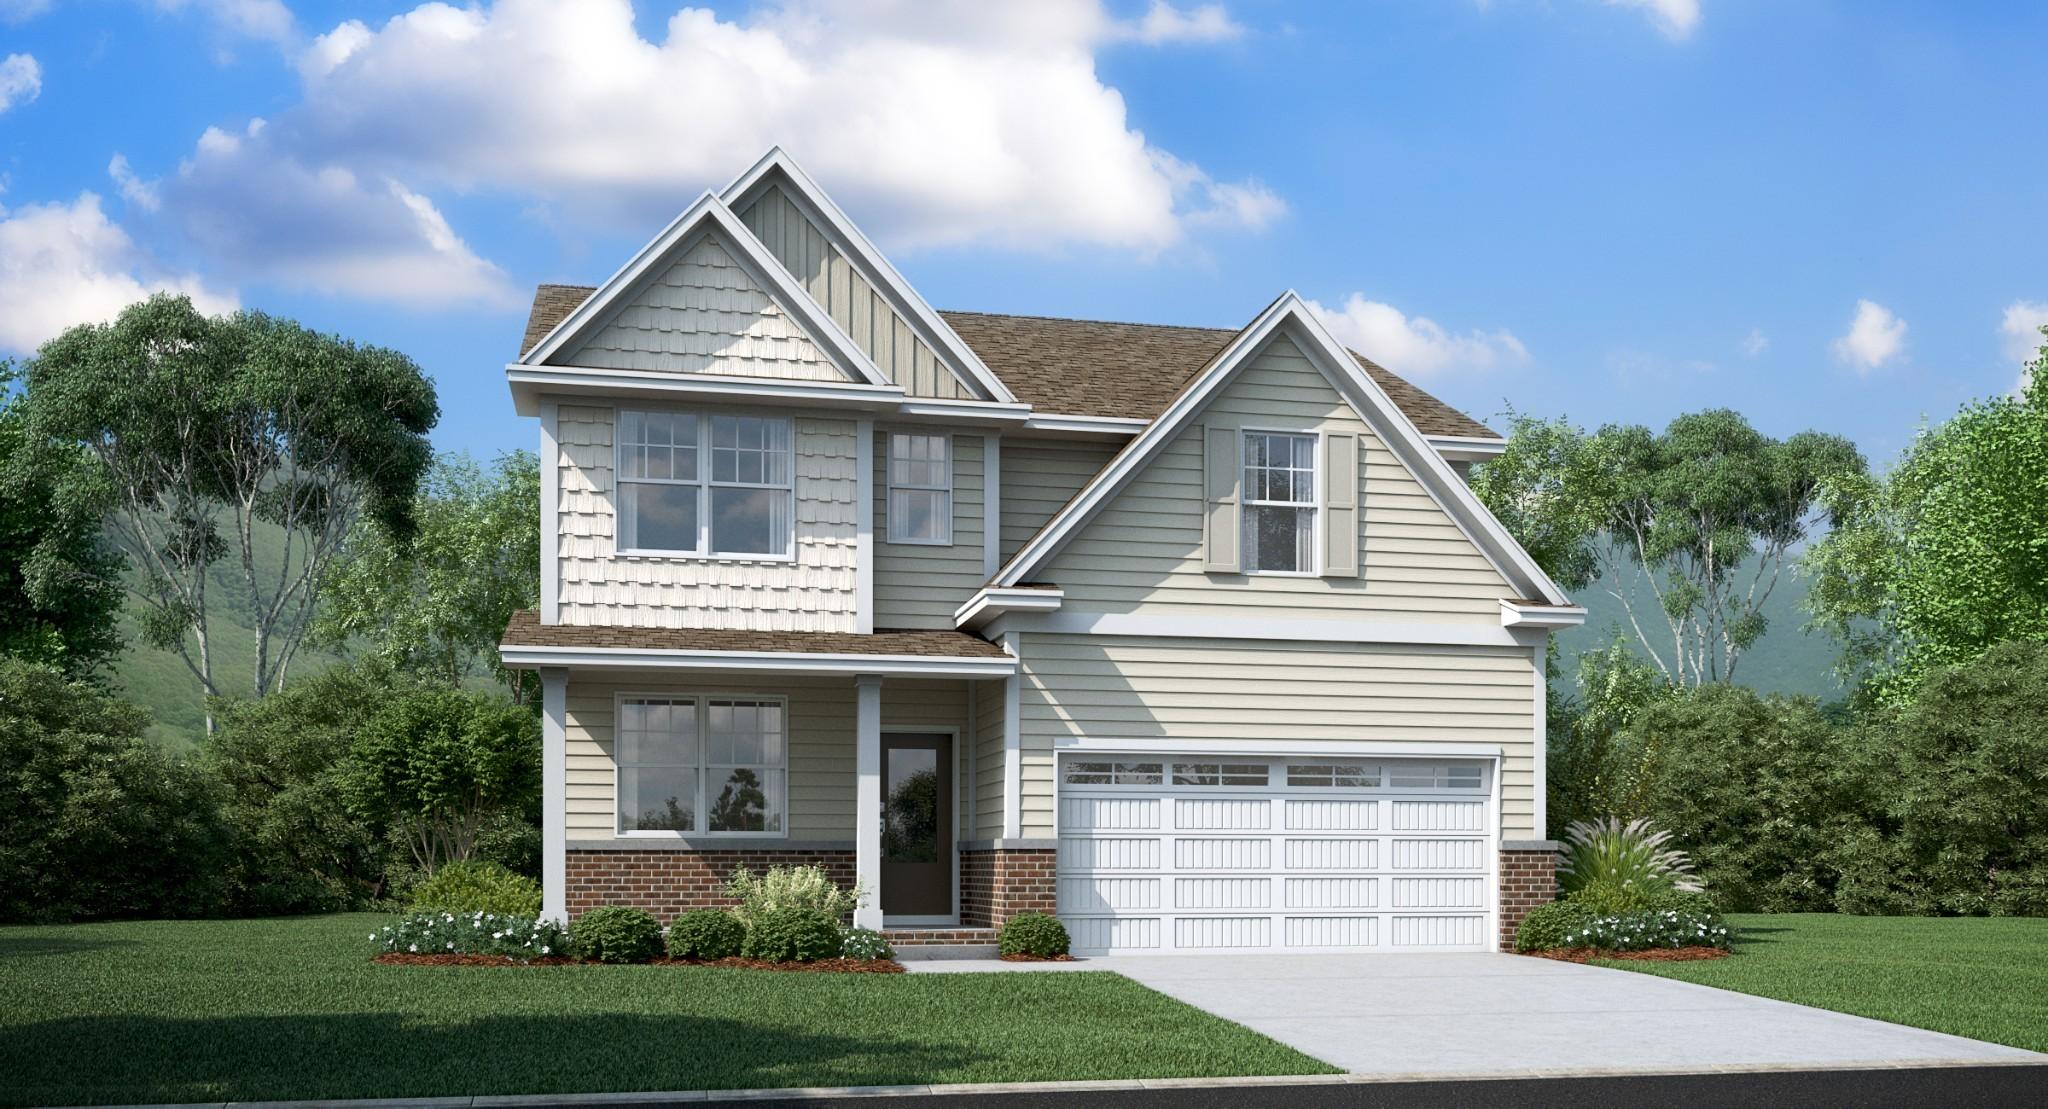 245 Ferdinand Drive, Gallatin, TN 37066 - Gallatin, TN real estate listing